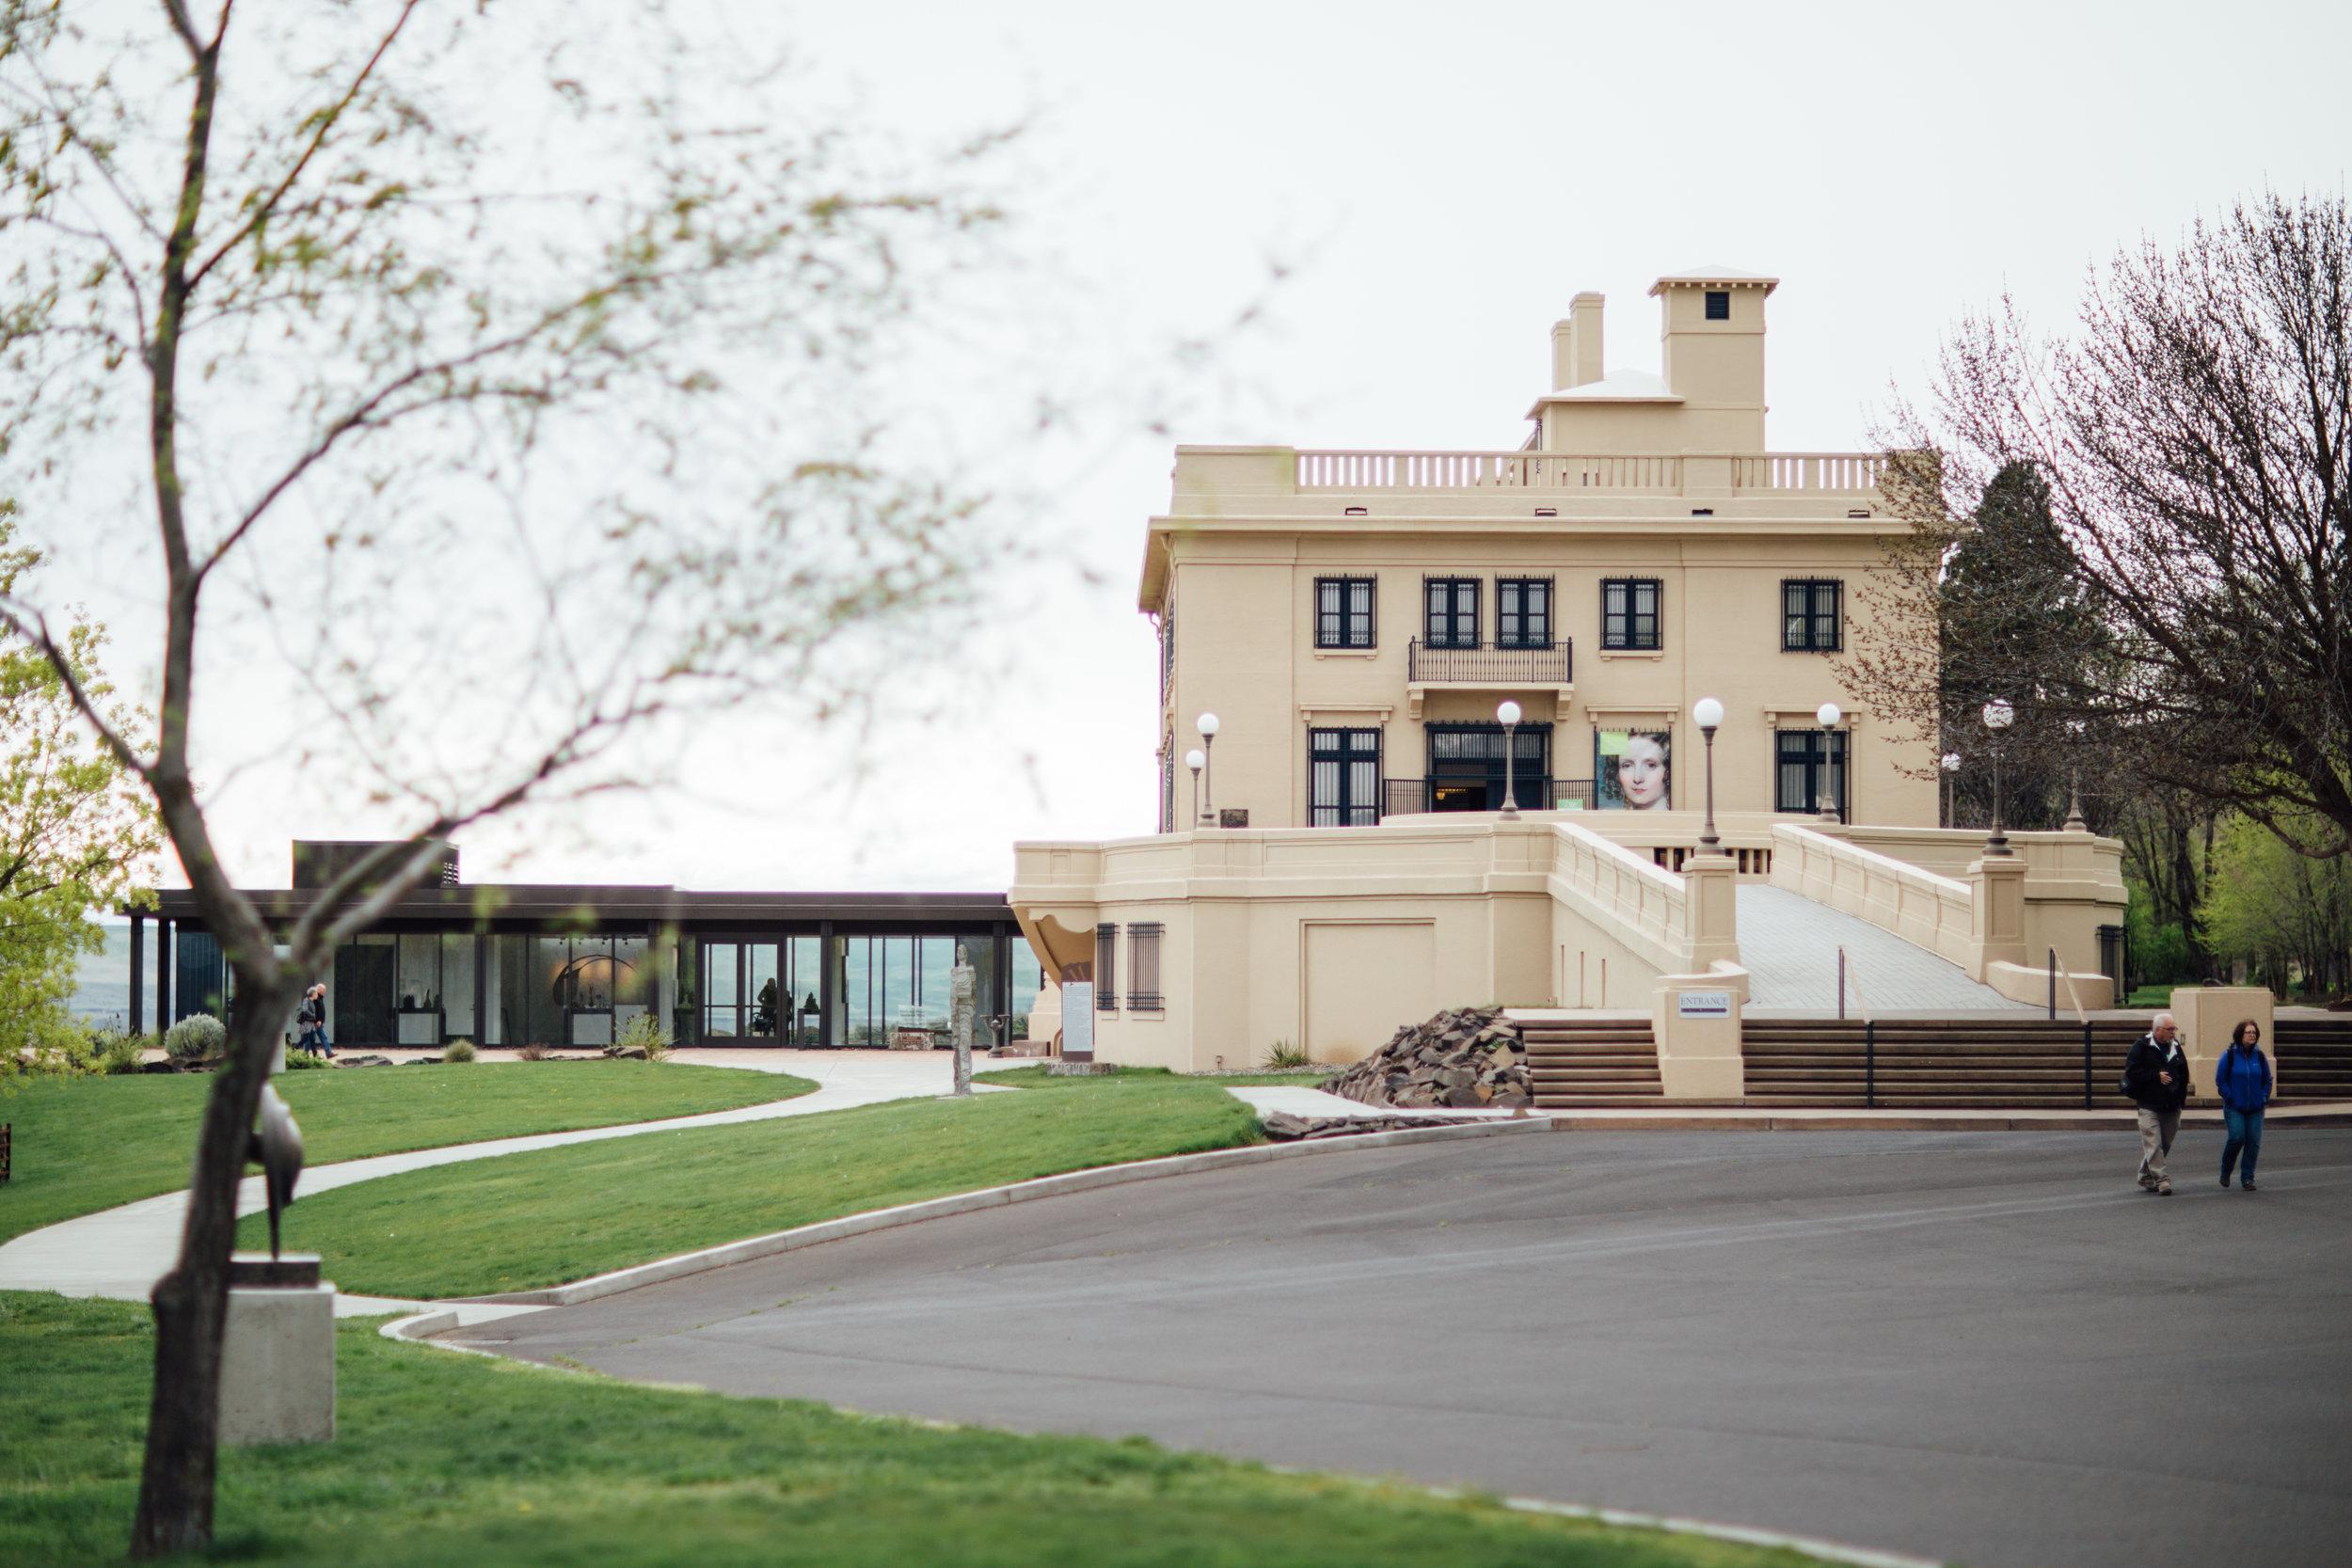 Maryhill Museum of Art, April 2018 — Grethershot: Morgan